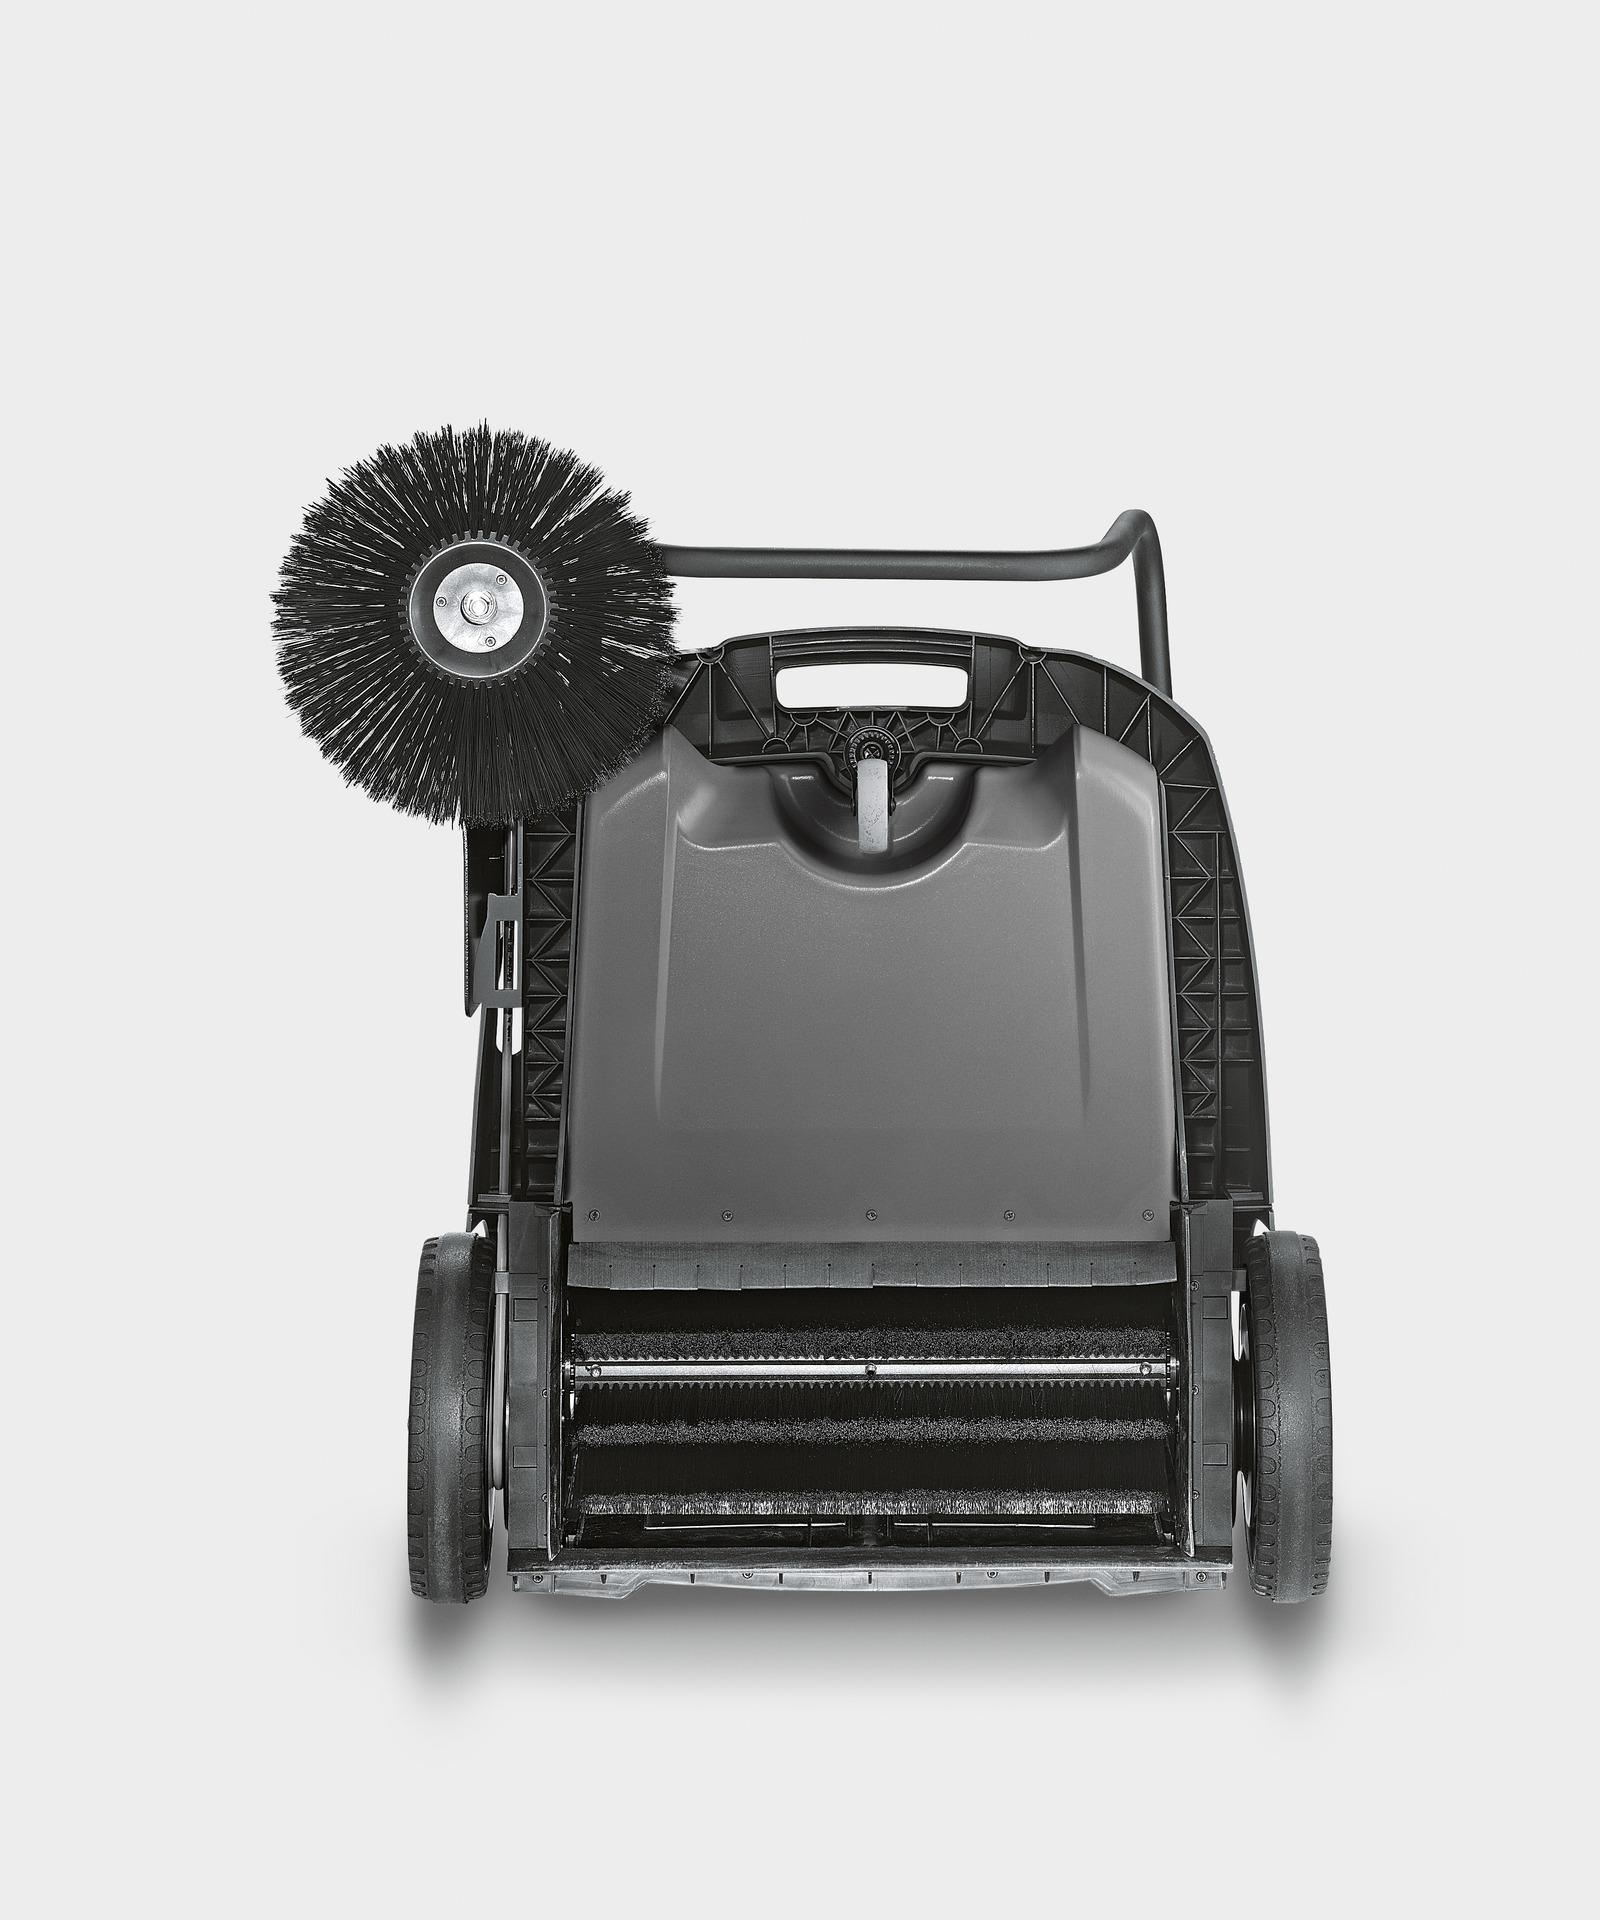 - KM 70/20 C Sweeper